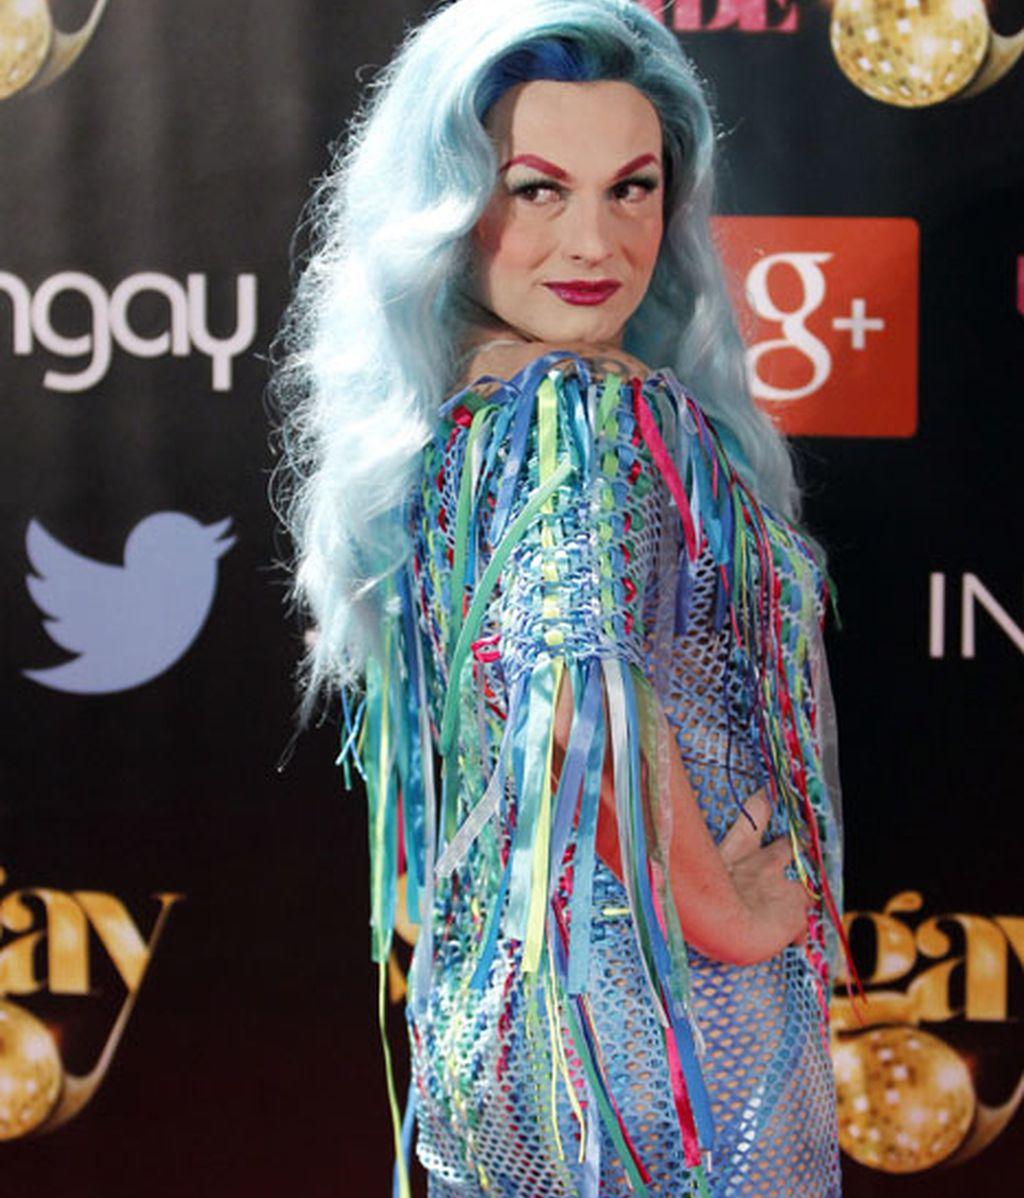 La Prohibida, una de las cantantes más interesantes del pop nacional